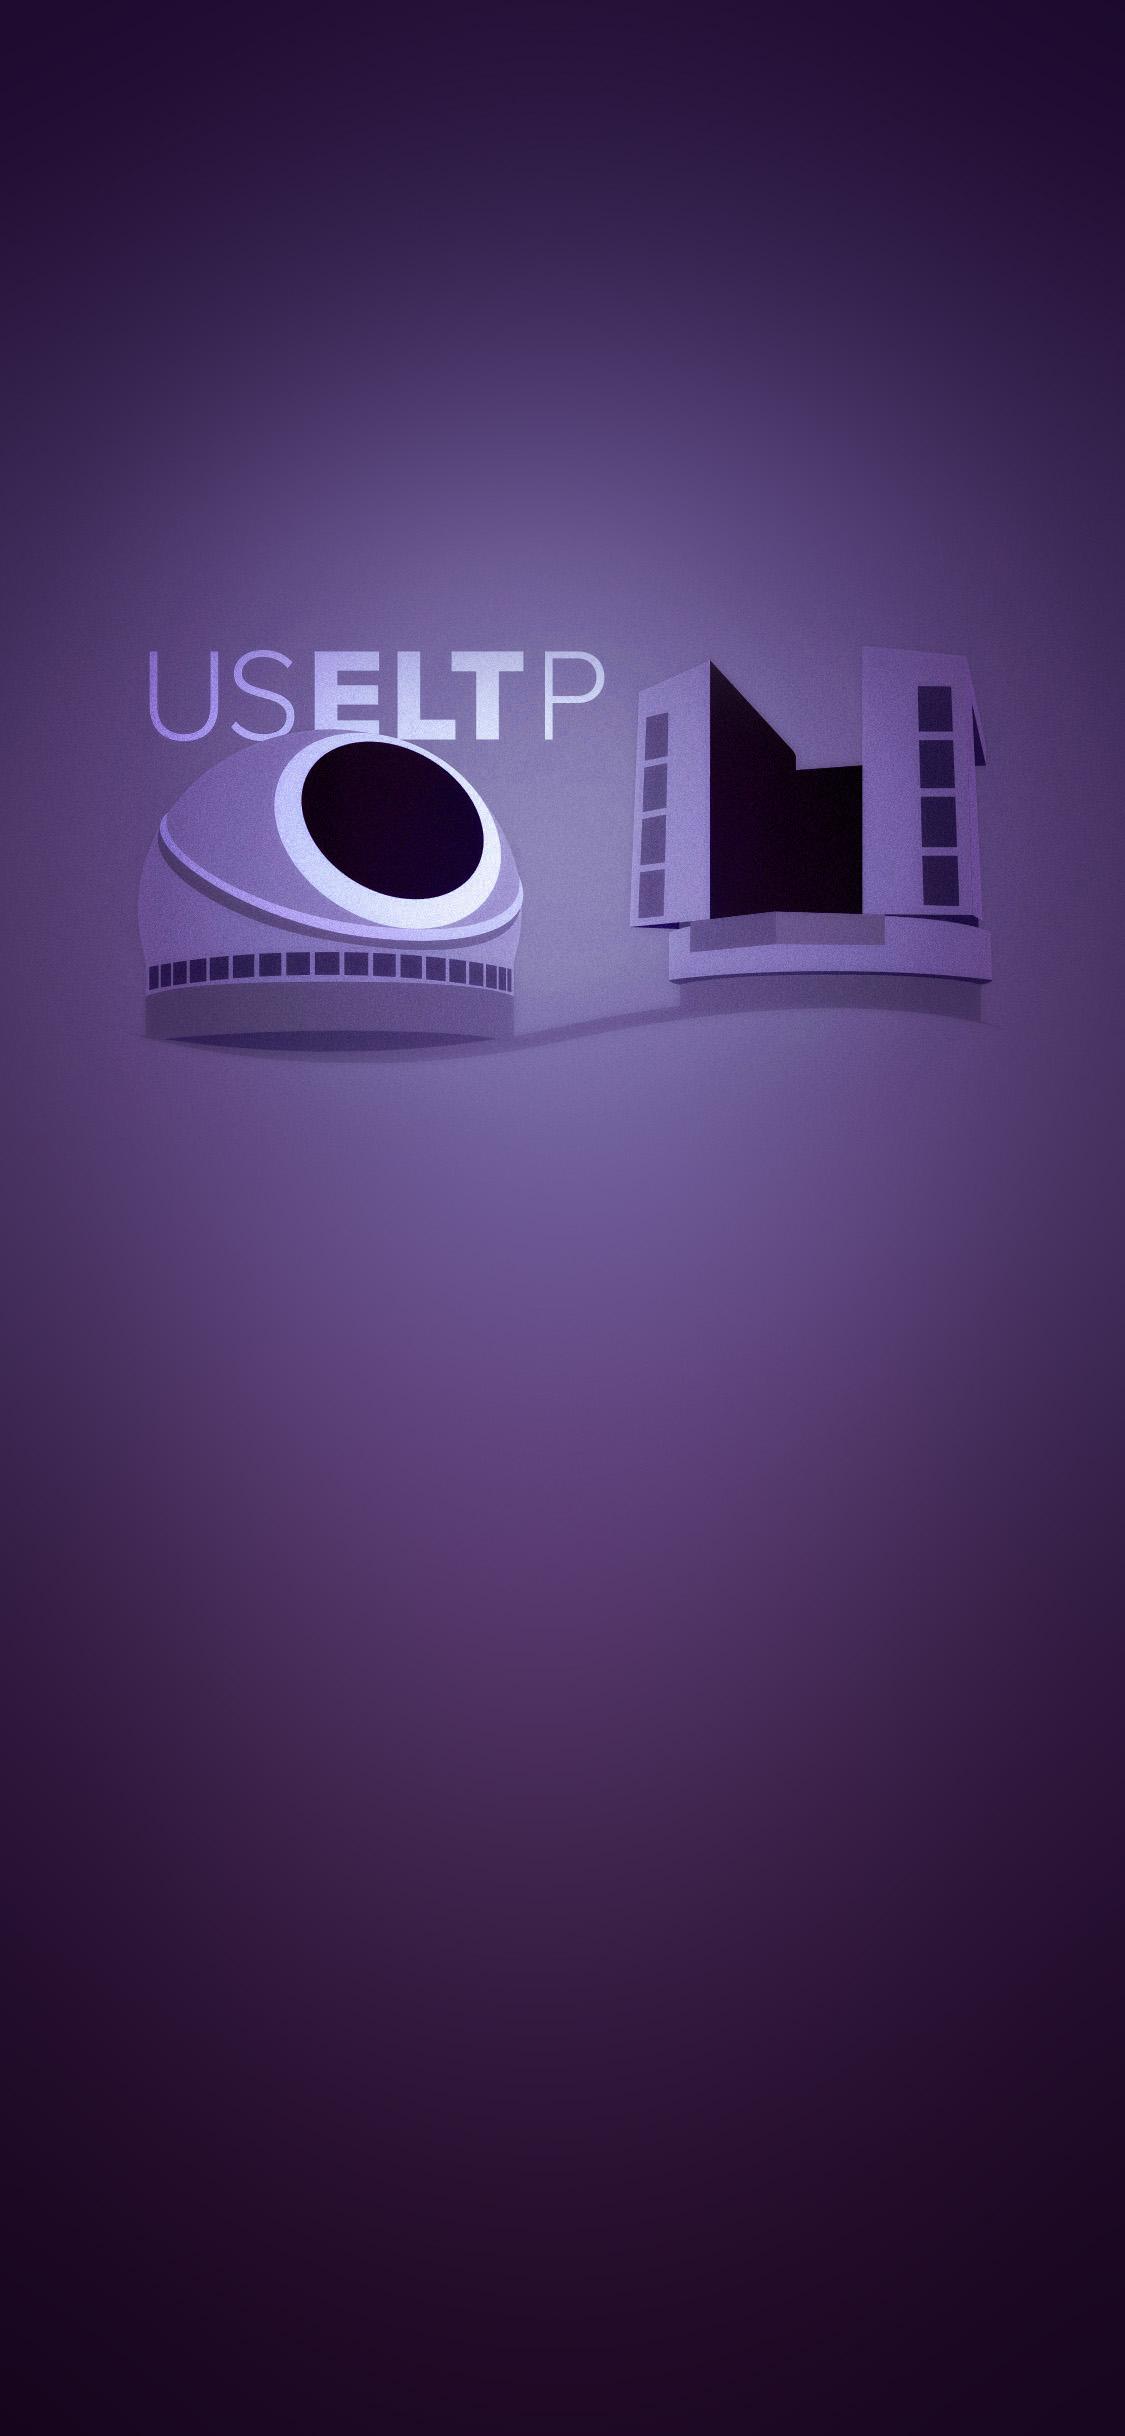 Phone Screen purple